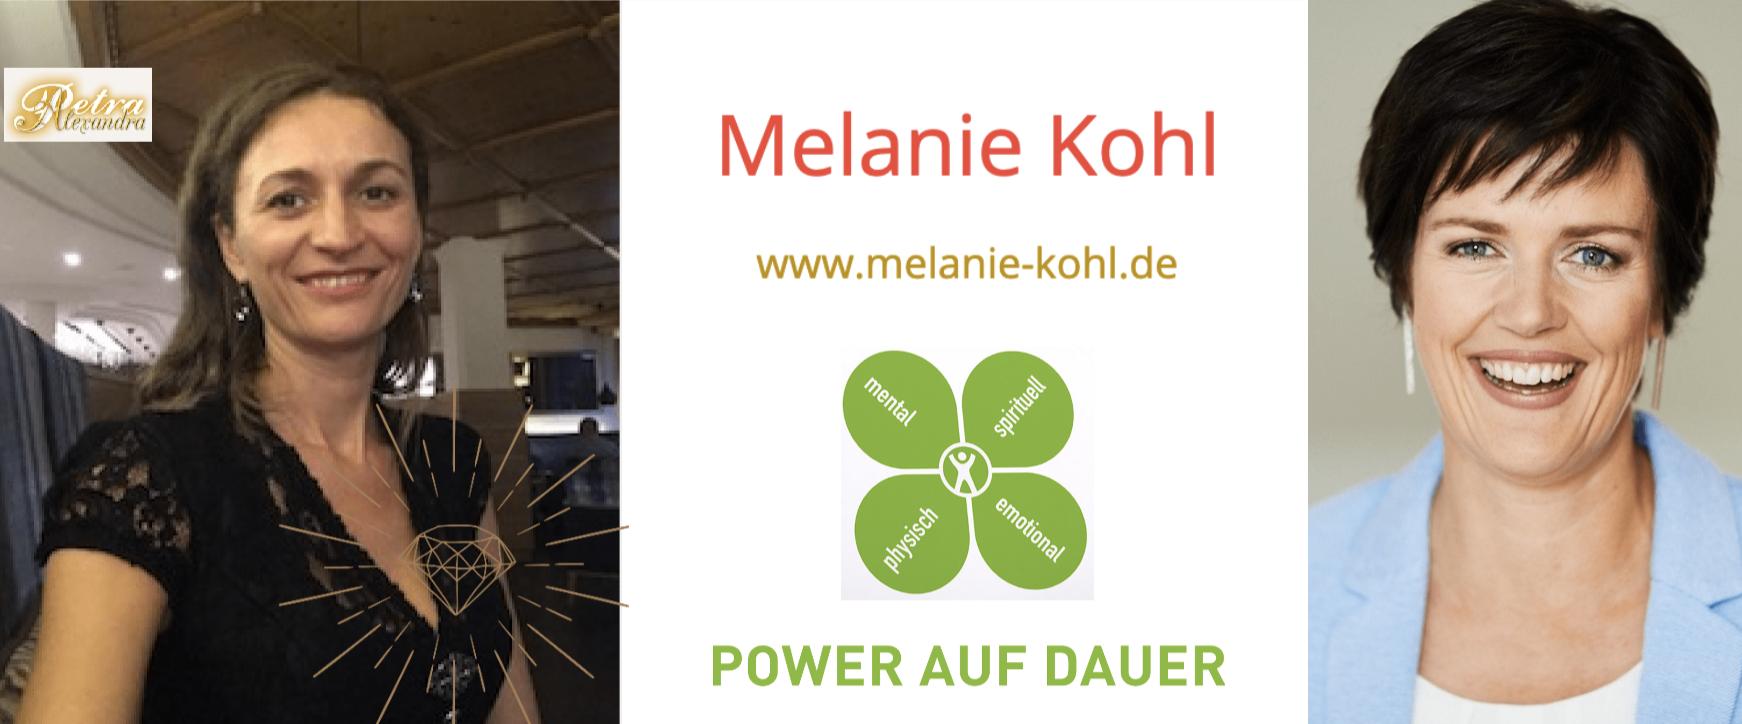 Melanie Kohl: Power auf Dauer